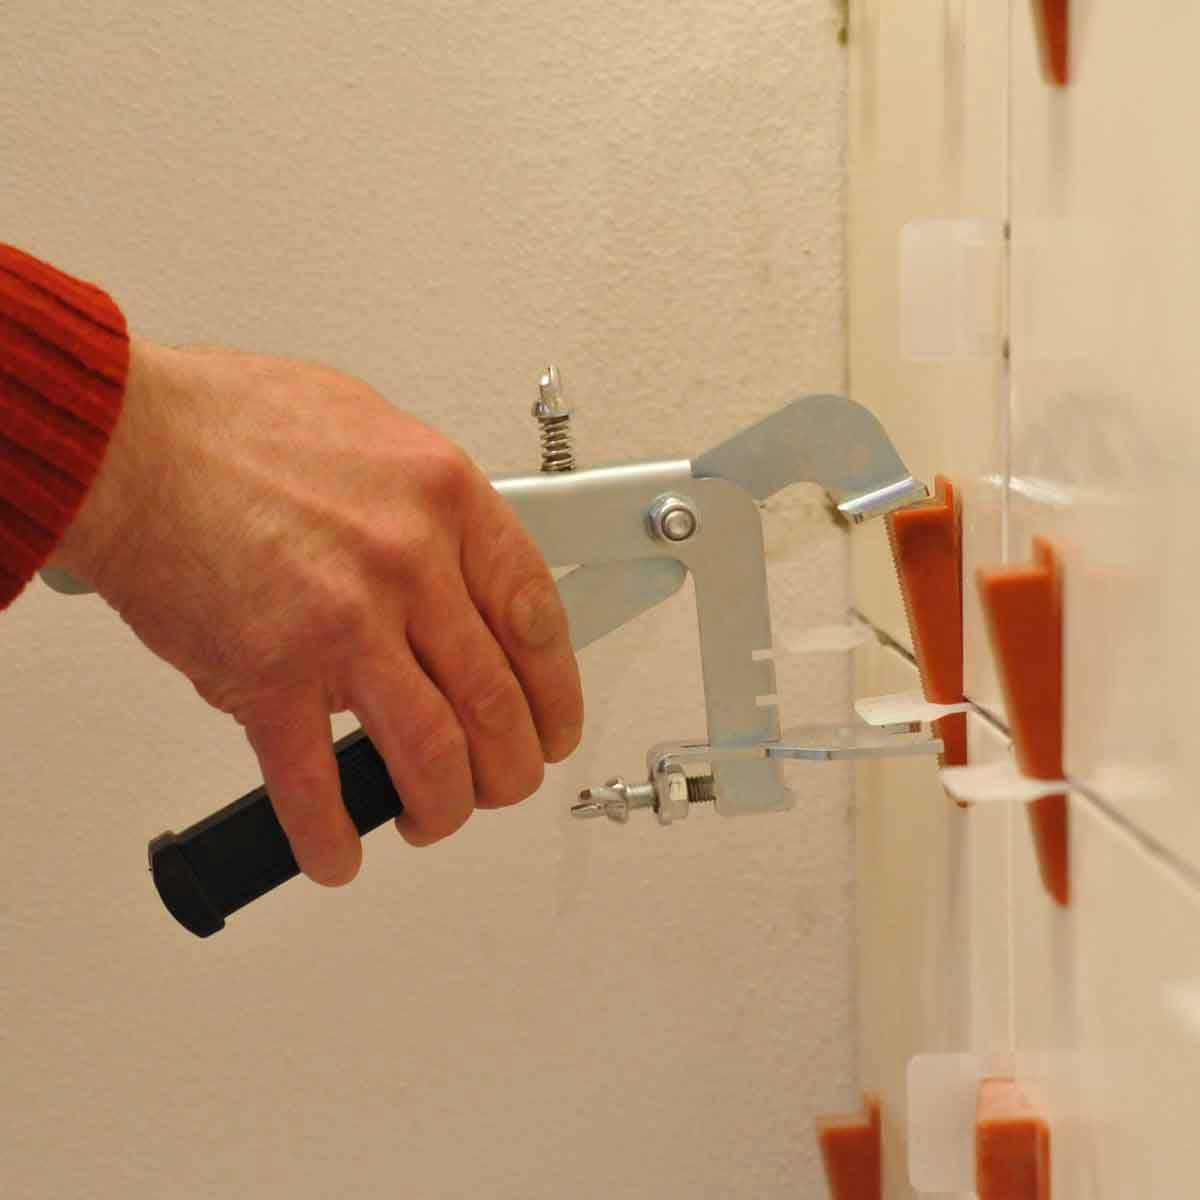 inserting wedge with raimondi wall pliers